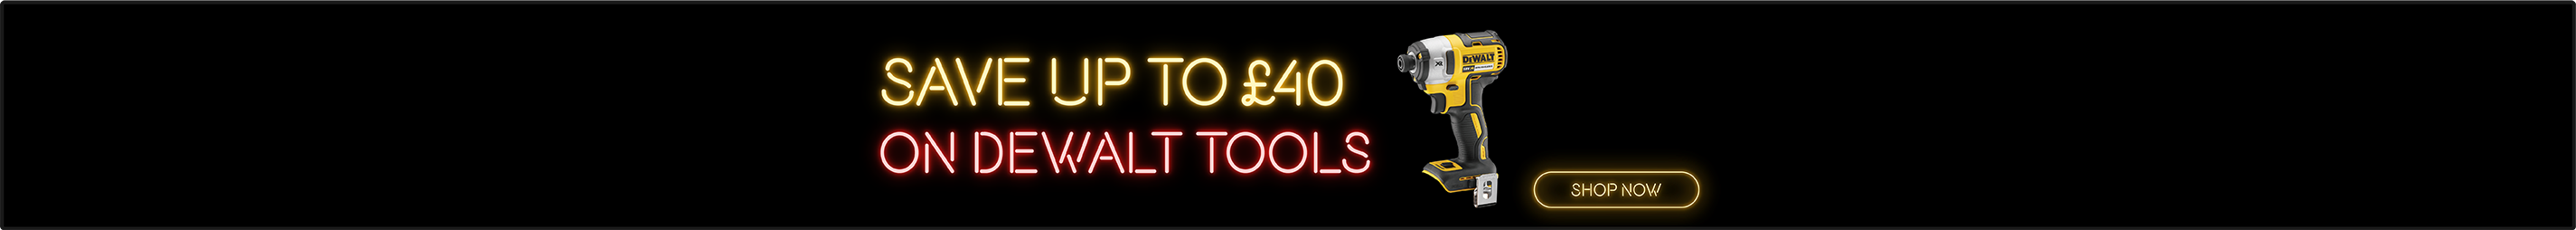 Save Up to £40 on DeWalt Tools